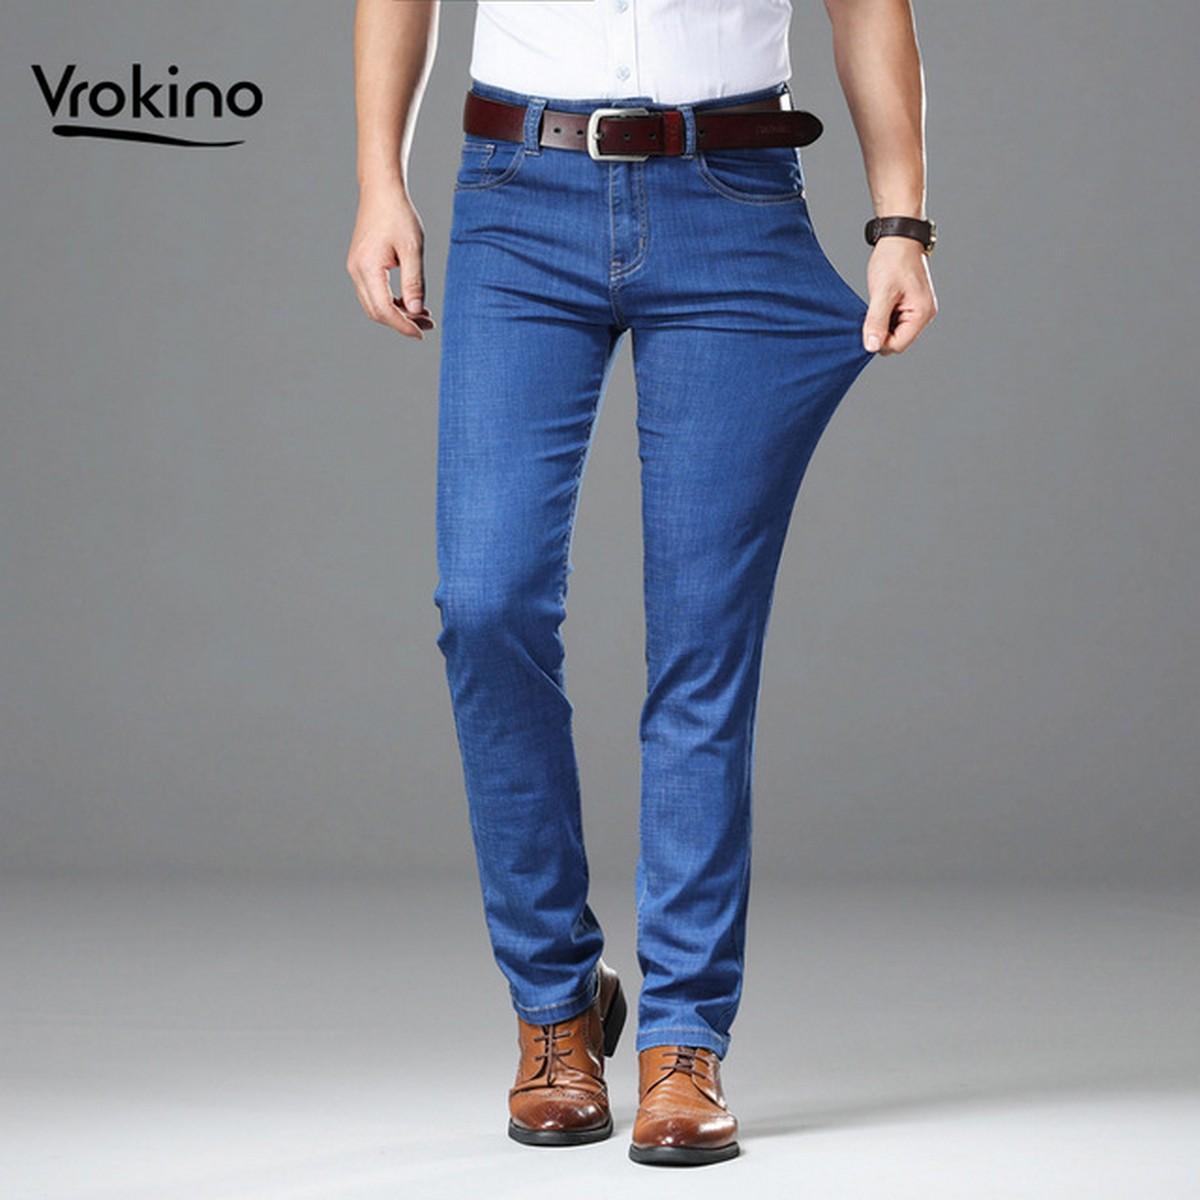 Men's Business Class Blue Color JEANS Slim-Fit Pants for Boy's Formal and Regular Fashion Wear